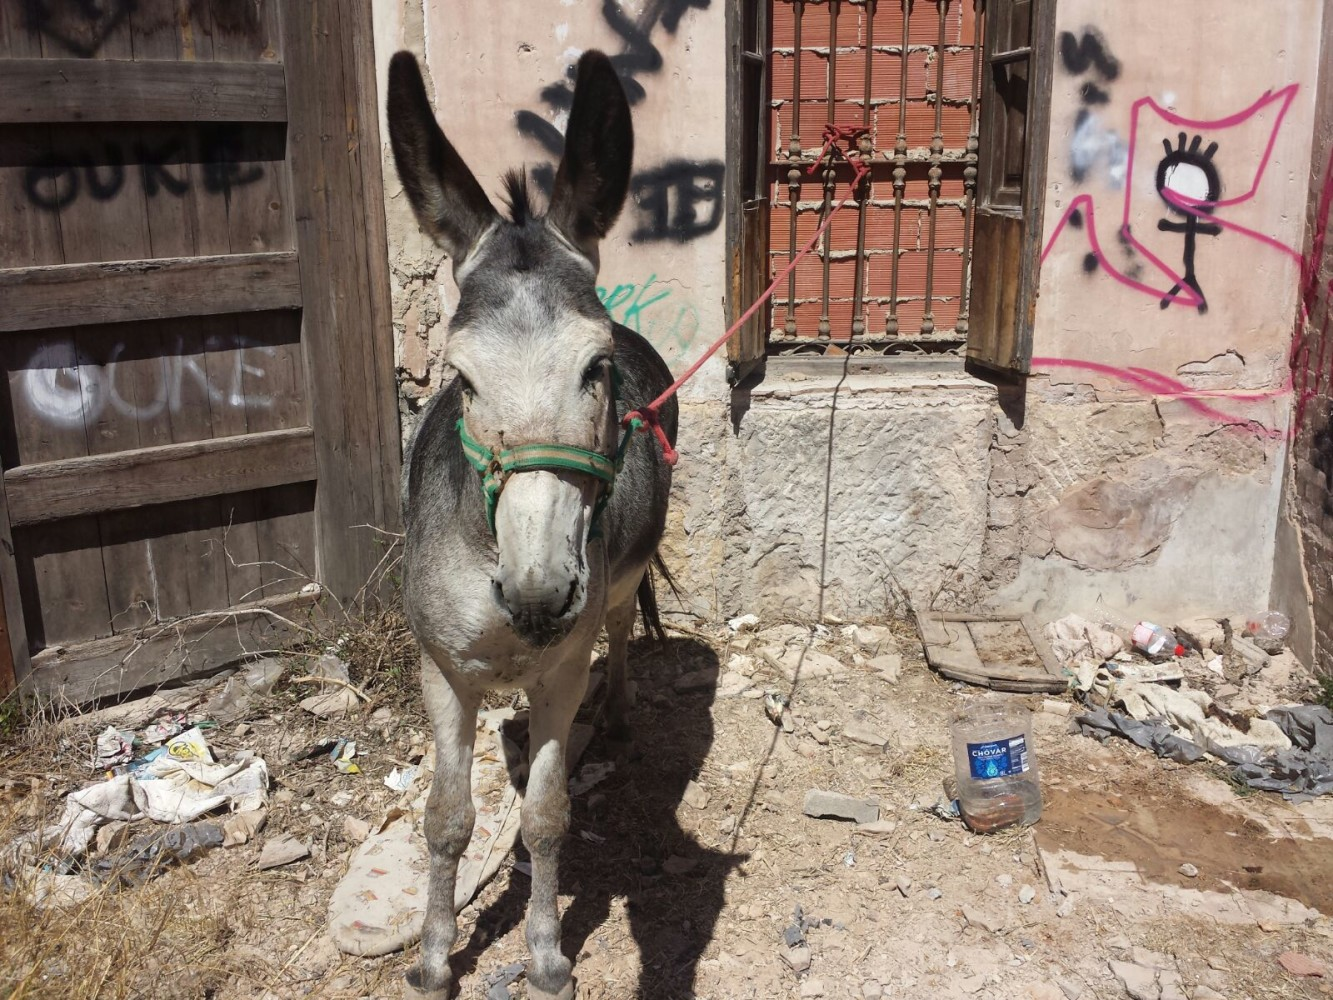 aa_burro